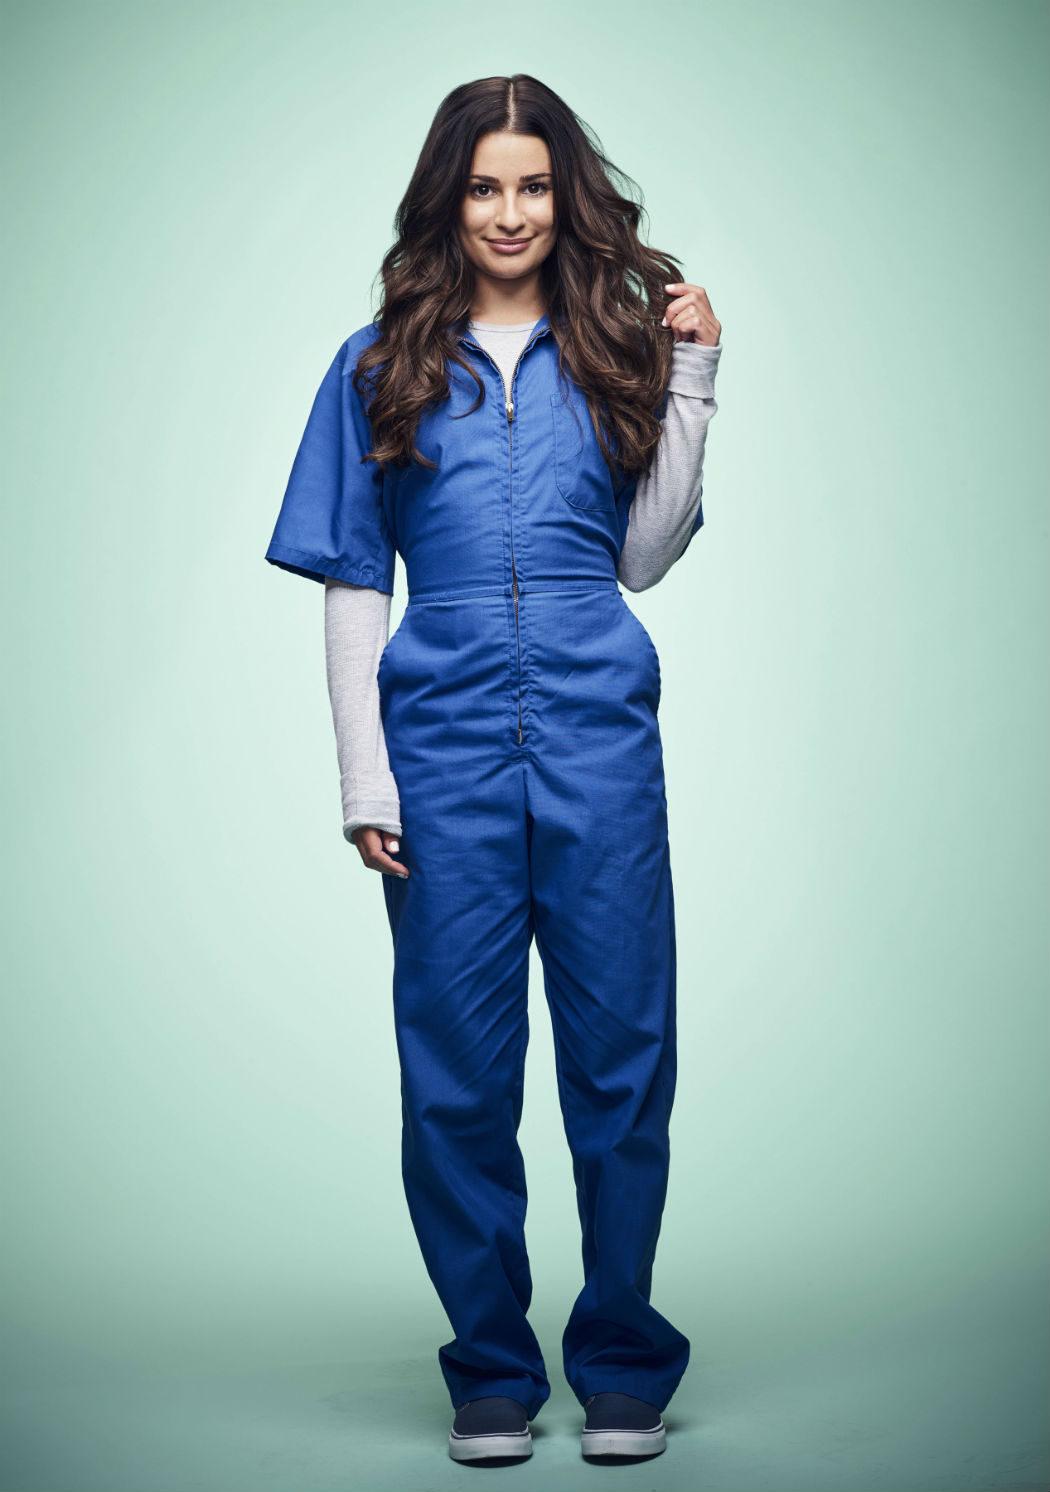 Lea Michele como Hester Ulrich